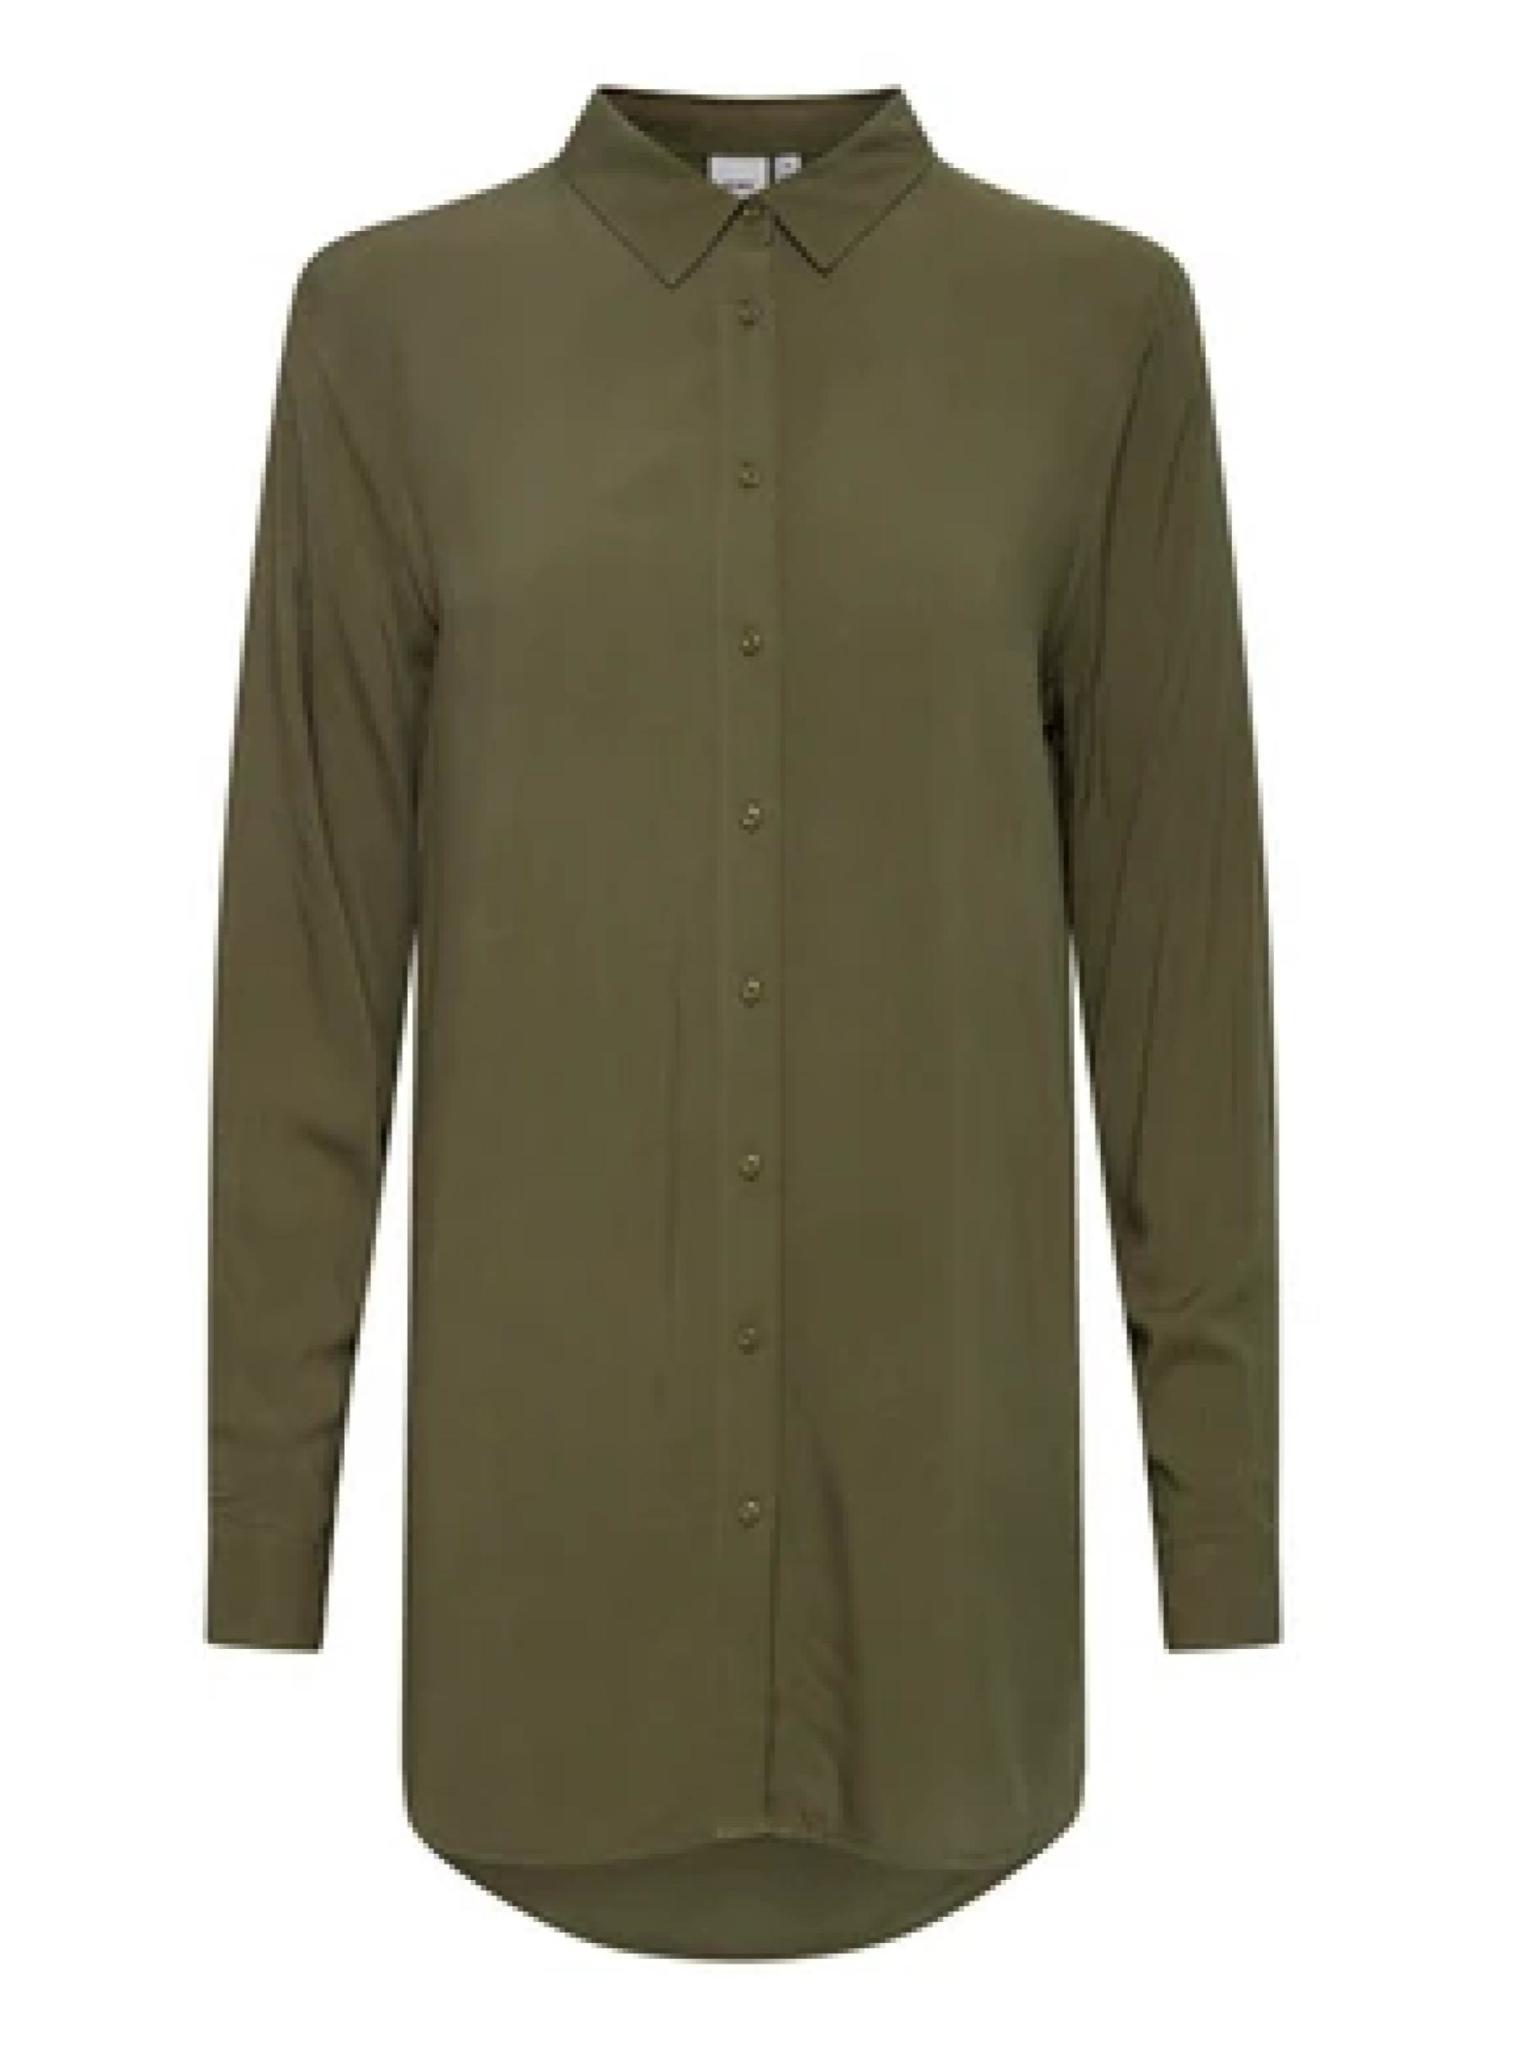 ICHI Main Button Down Long Sleeve Top